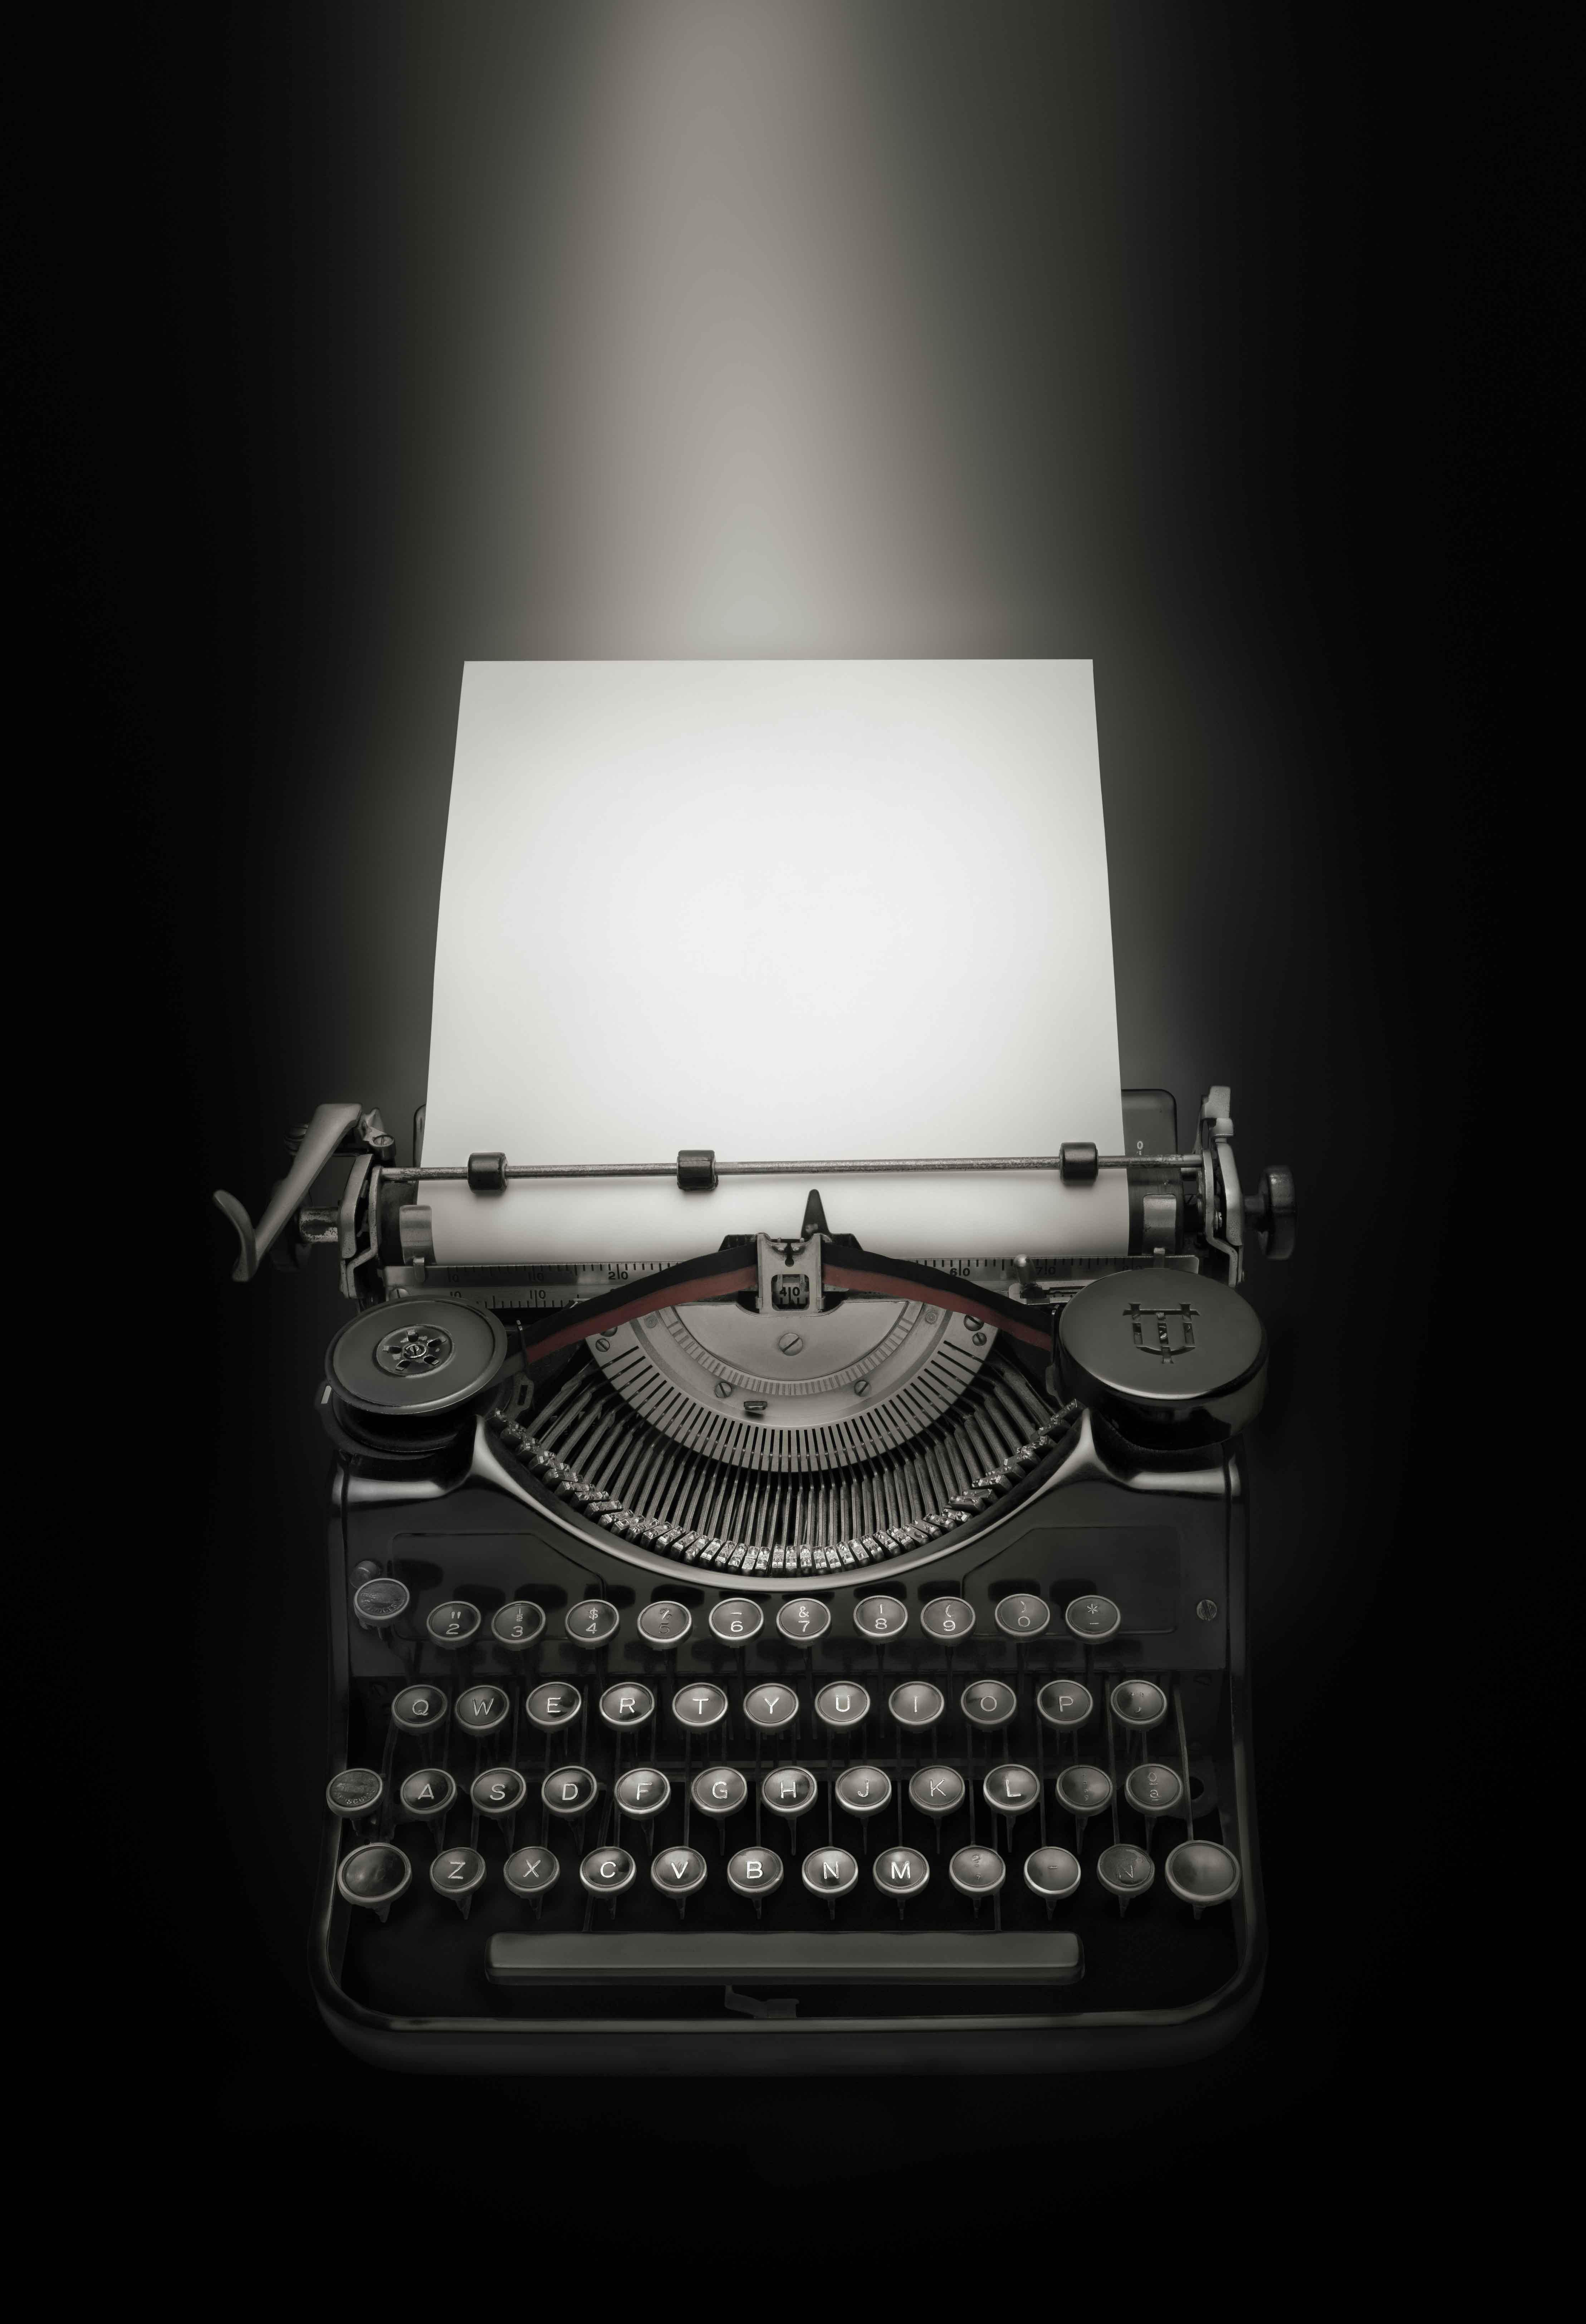 Vintage typewriter against black background